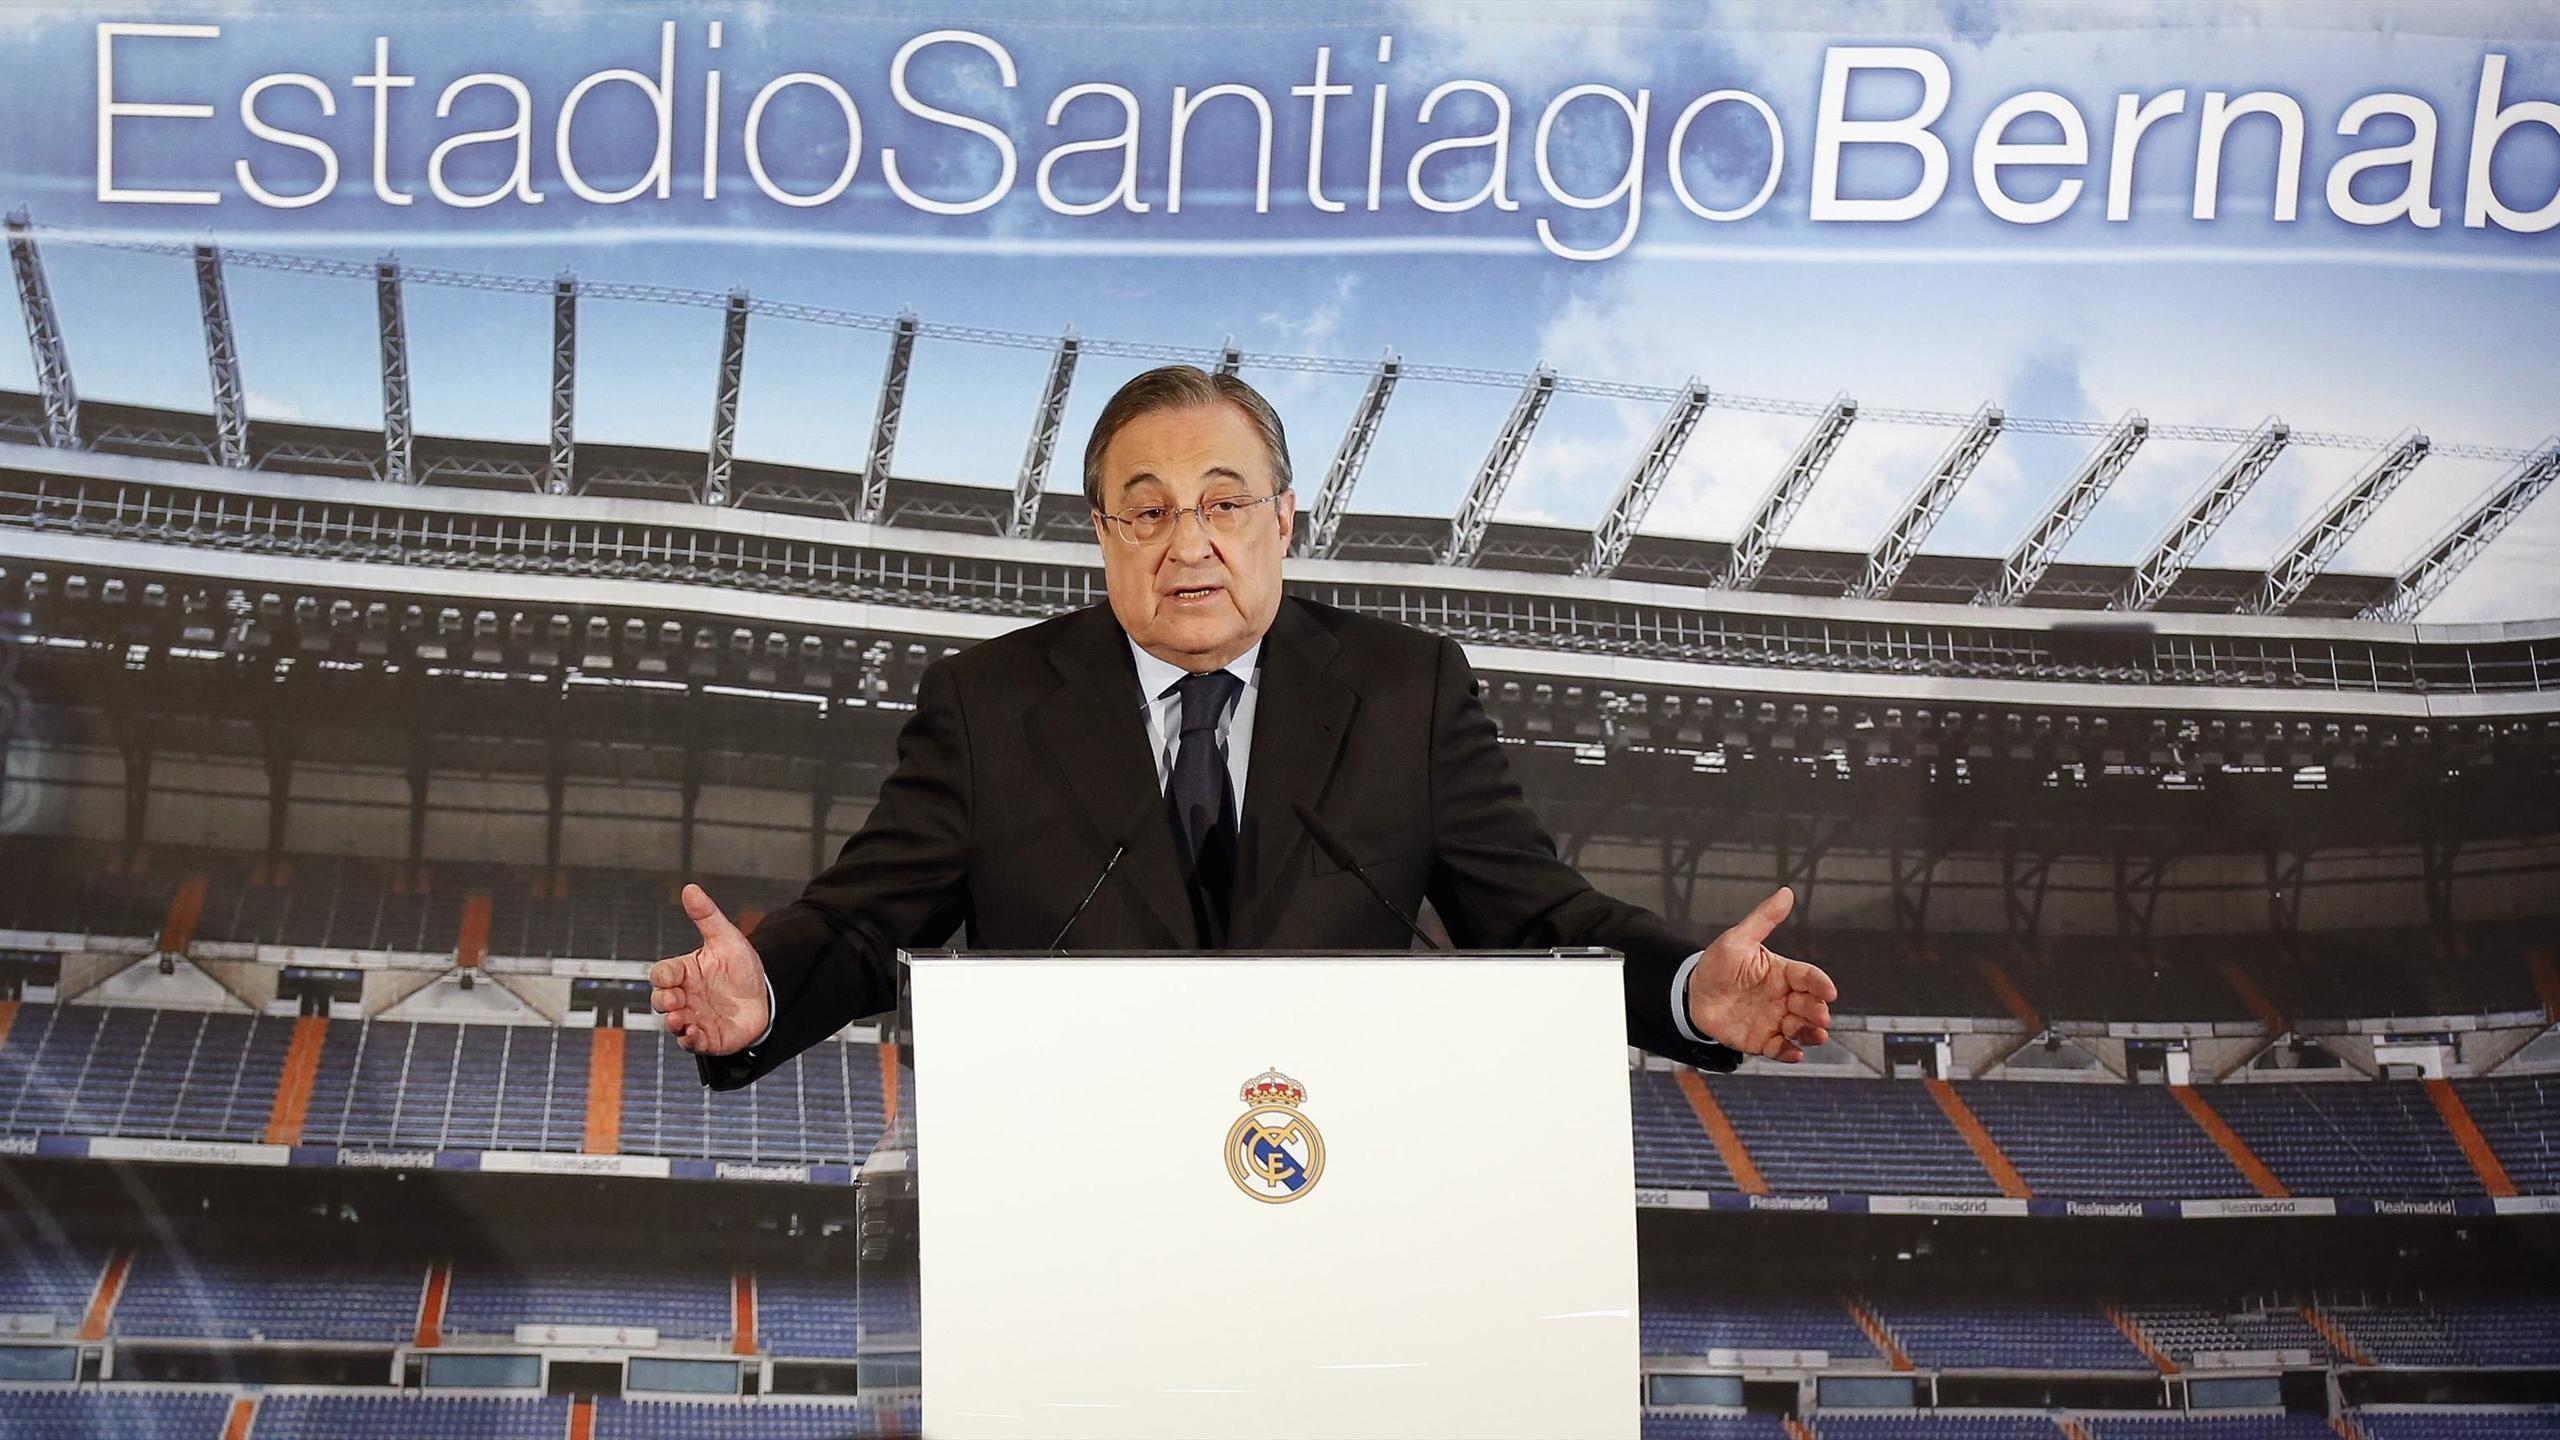 Florentino Pérez, président du Real Madrid